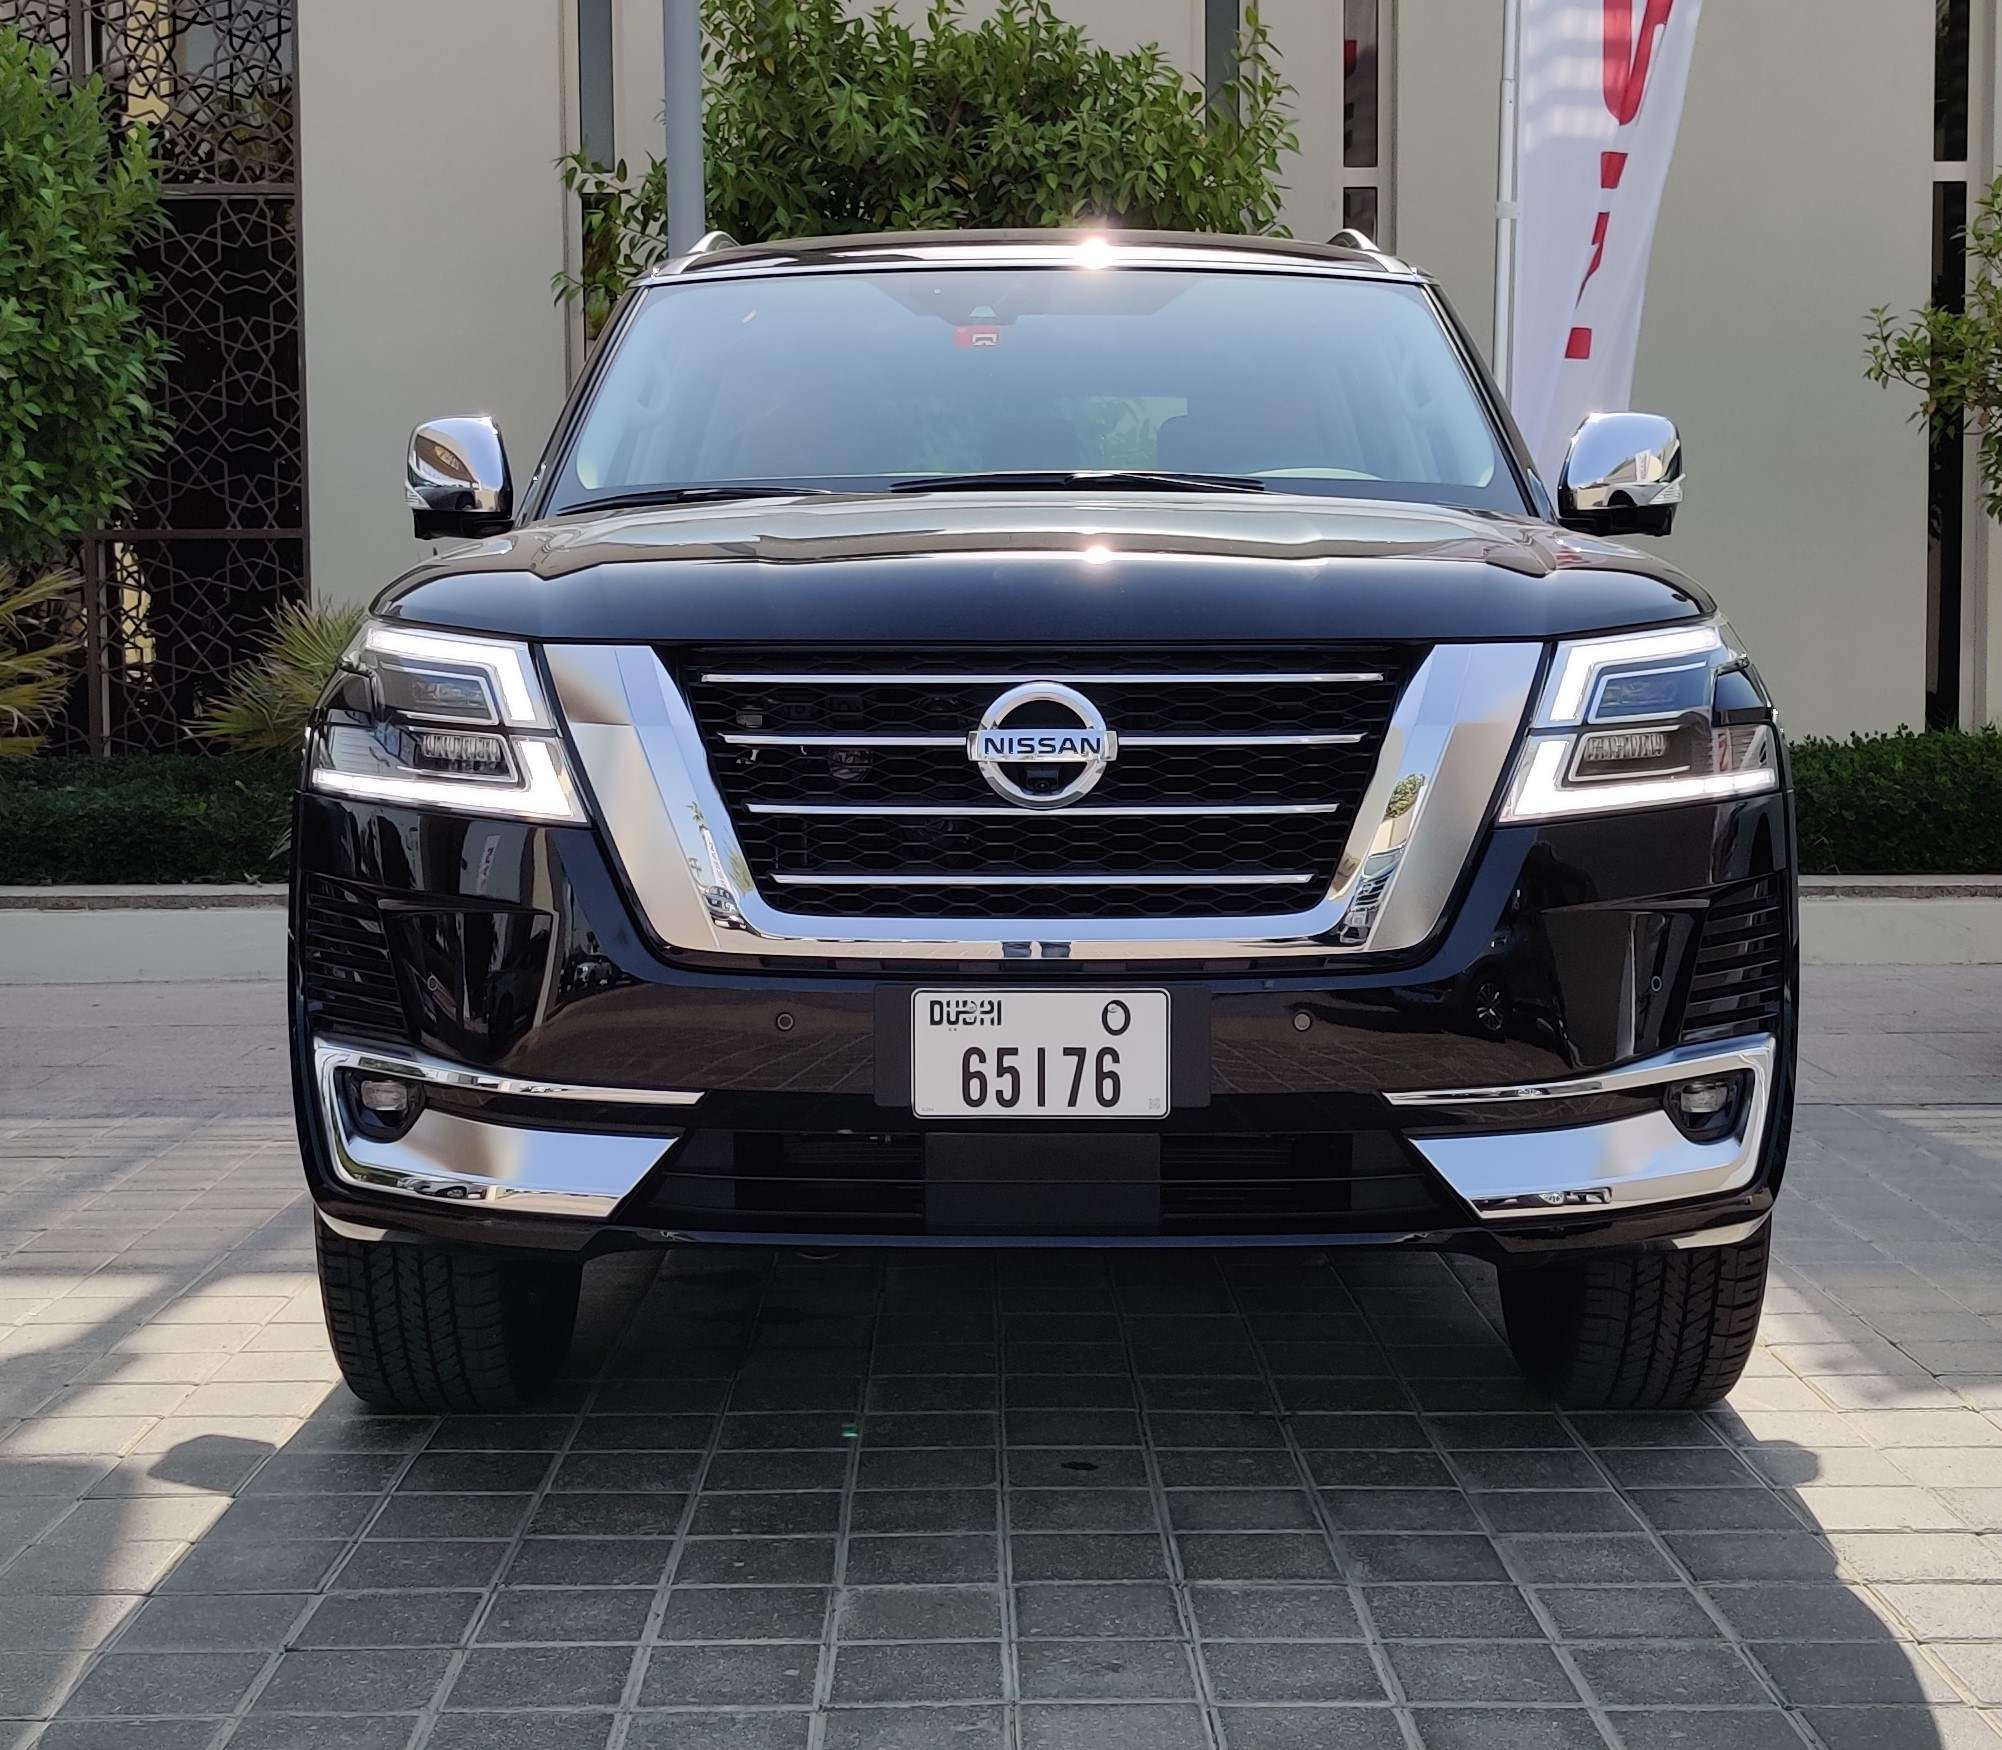 New Nissan Patrol 2020 2020 Nissan Patrol Royale Ute Y62